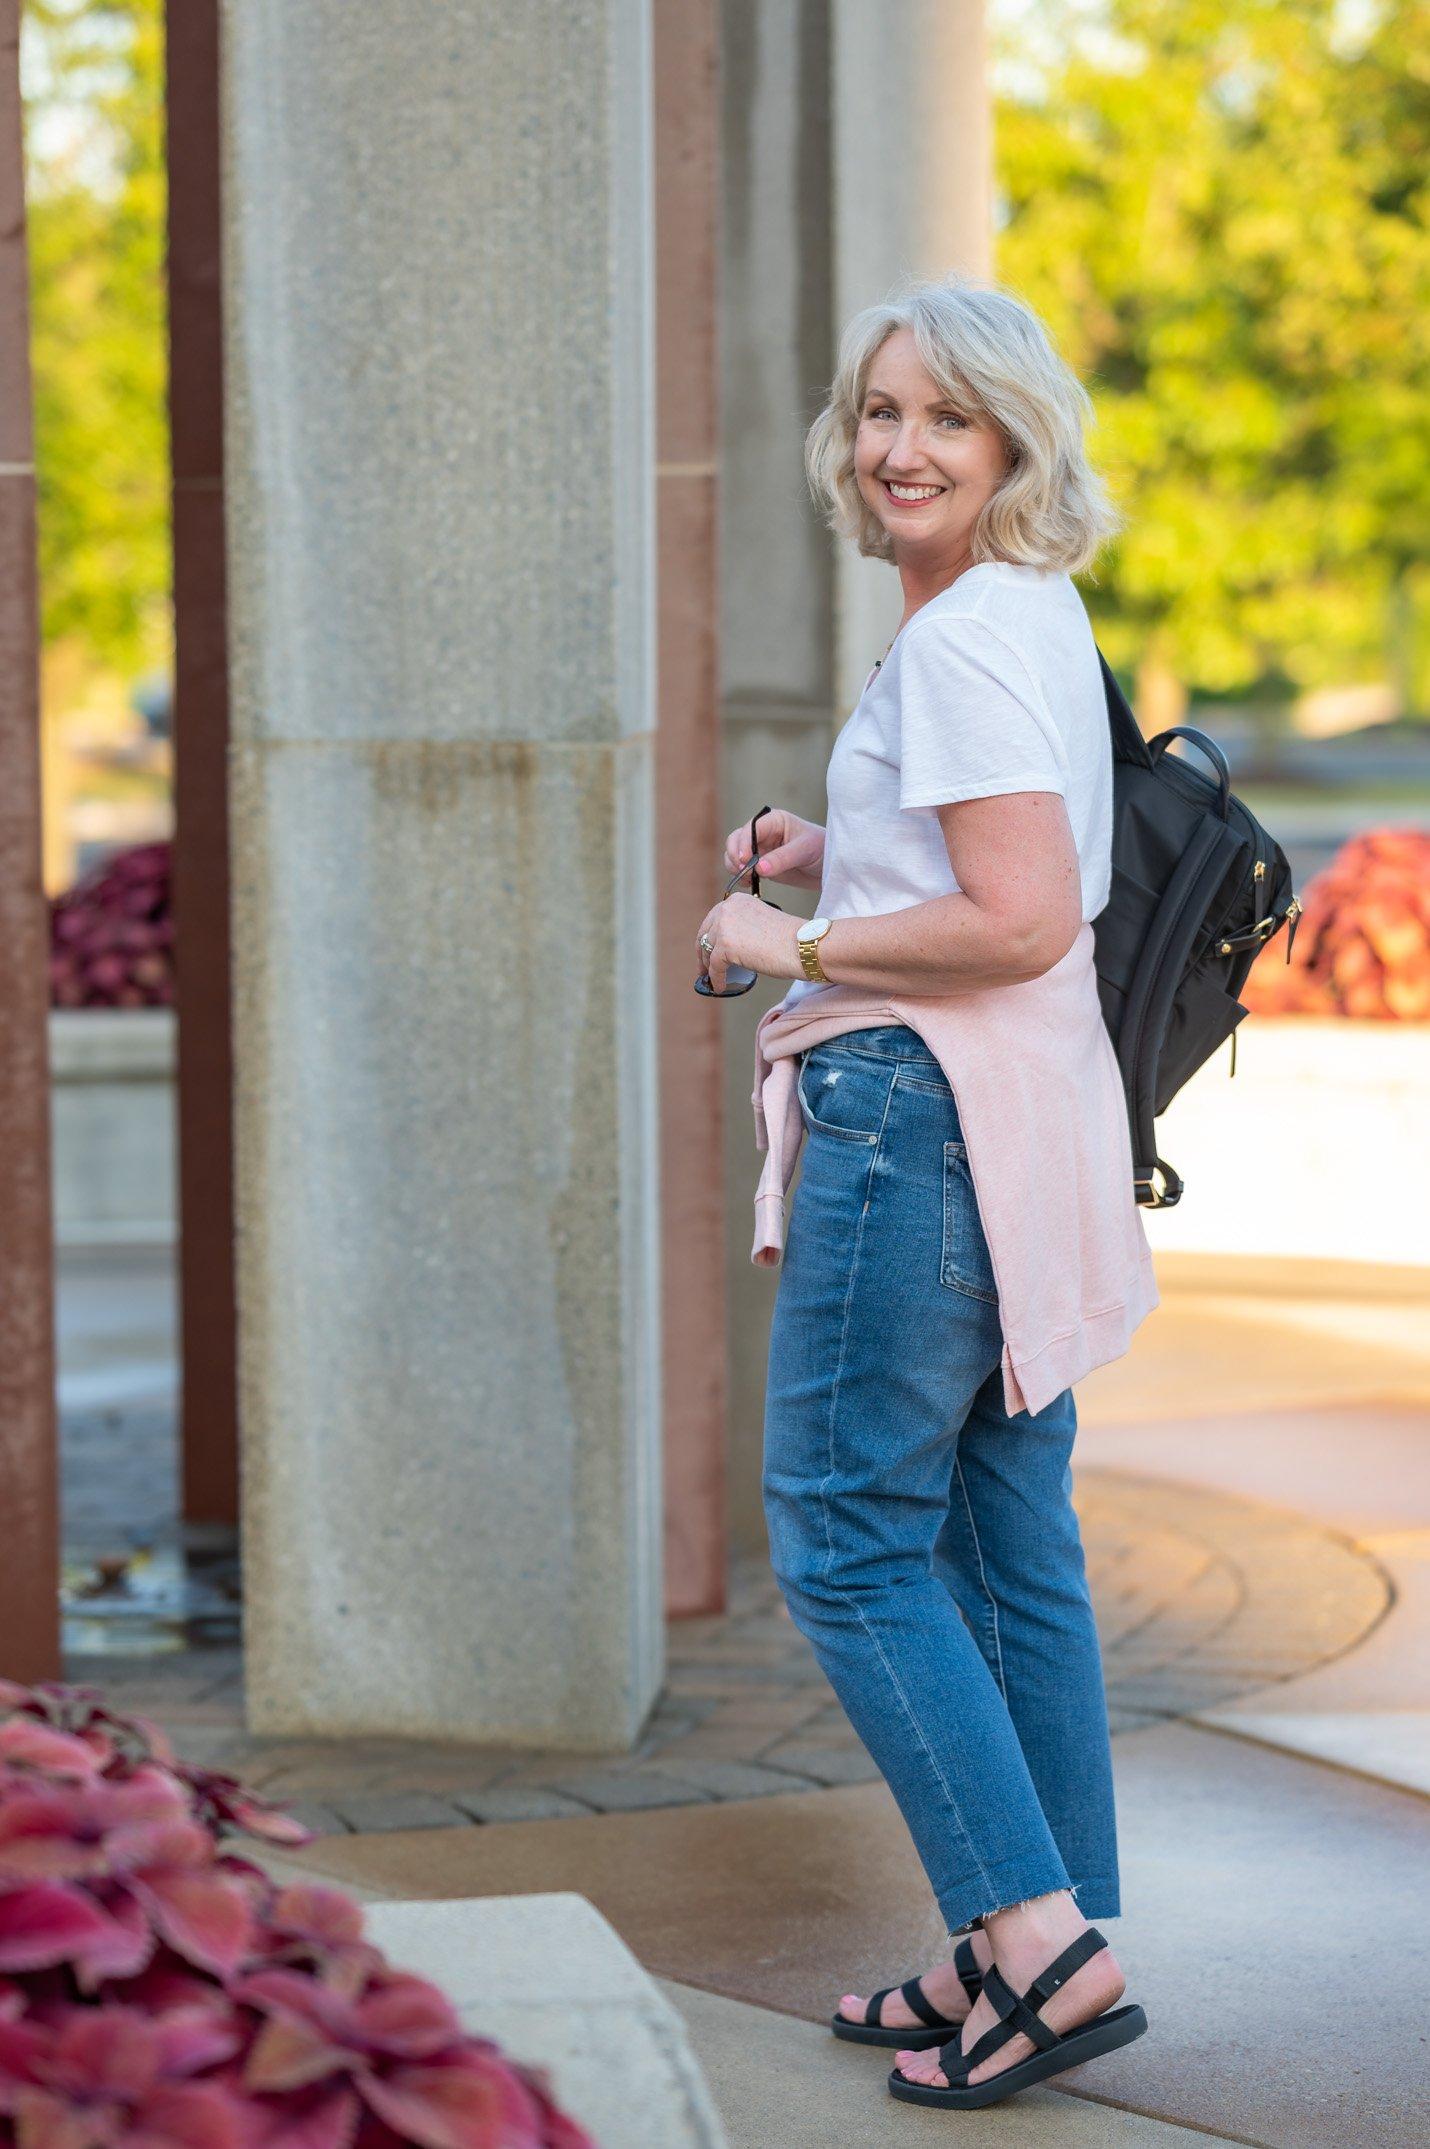 Sweatshirt with Jeans